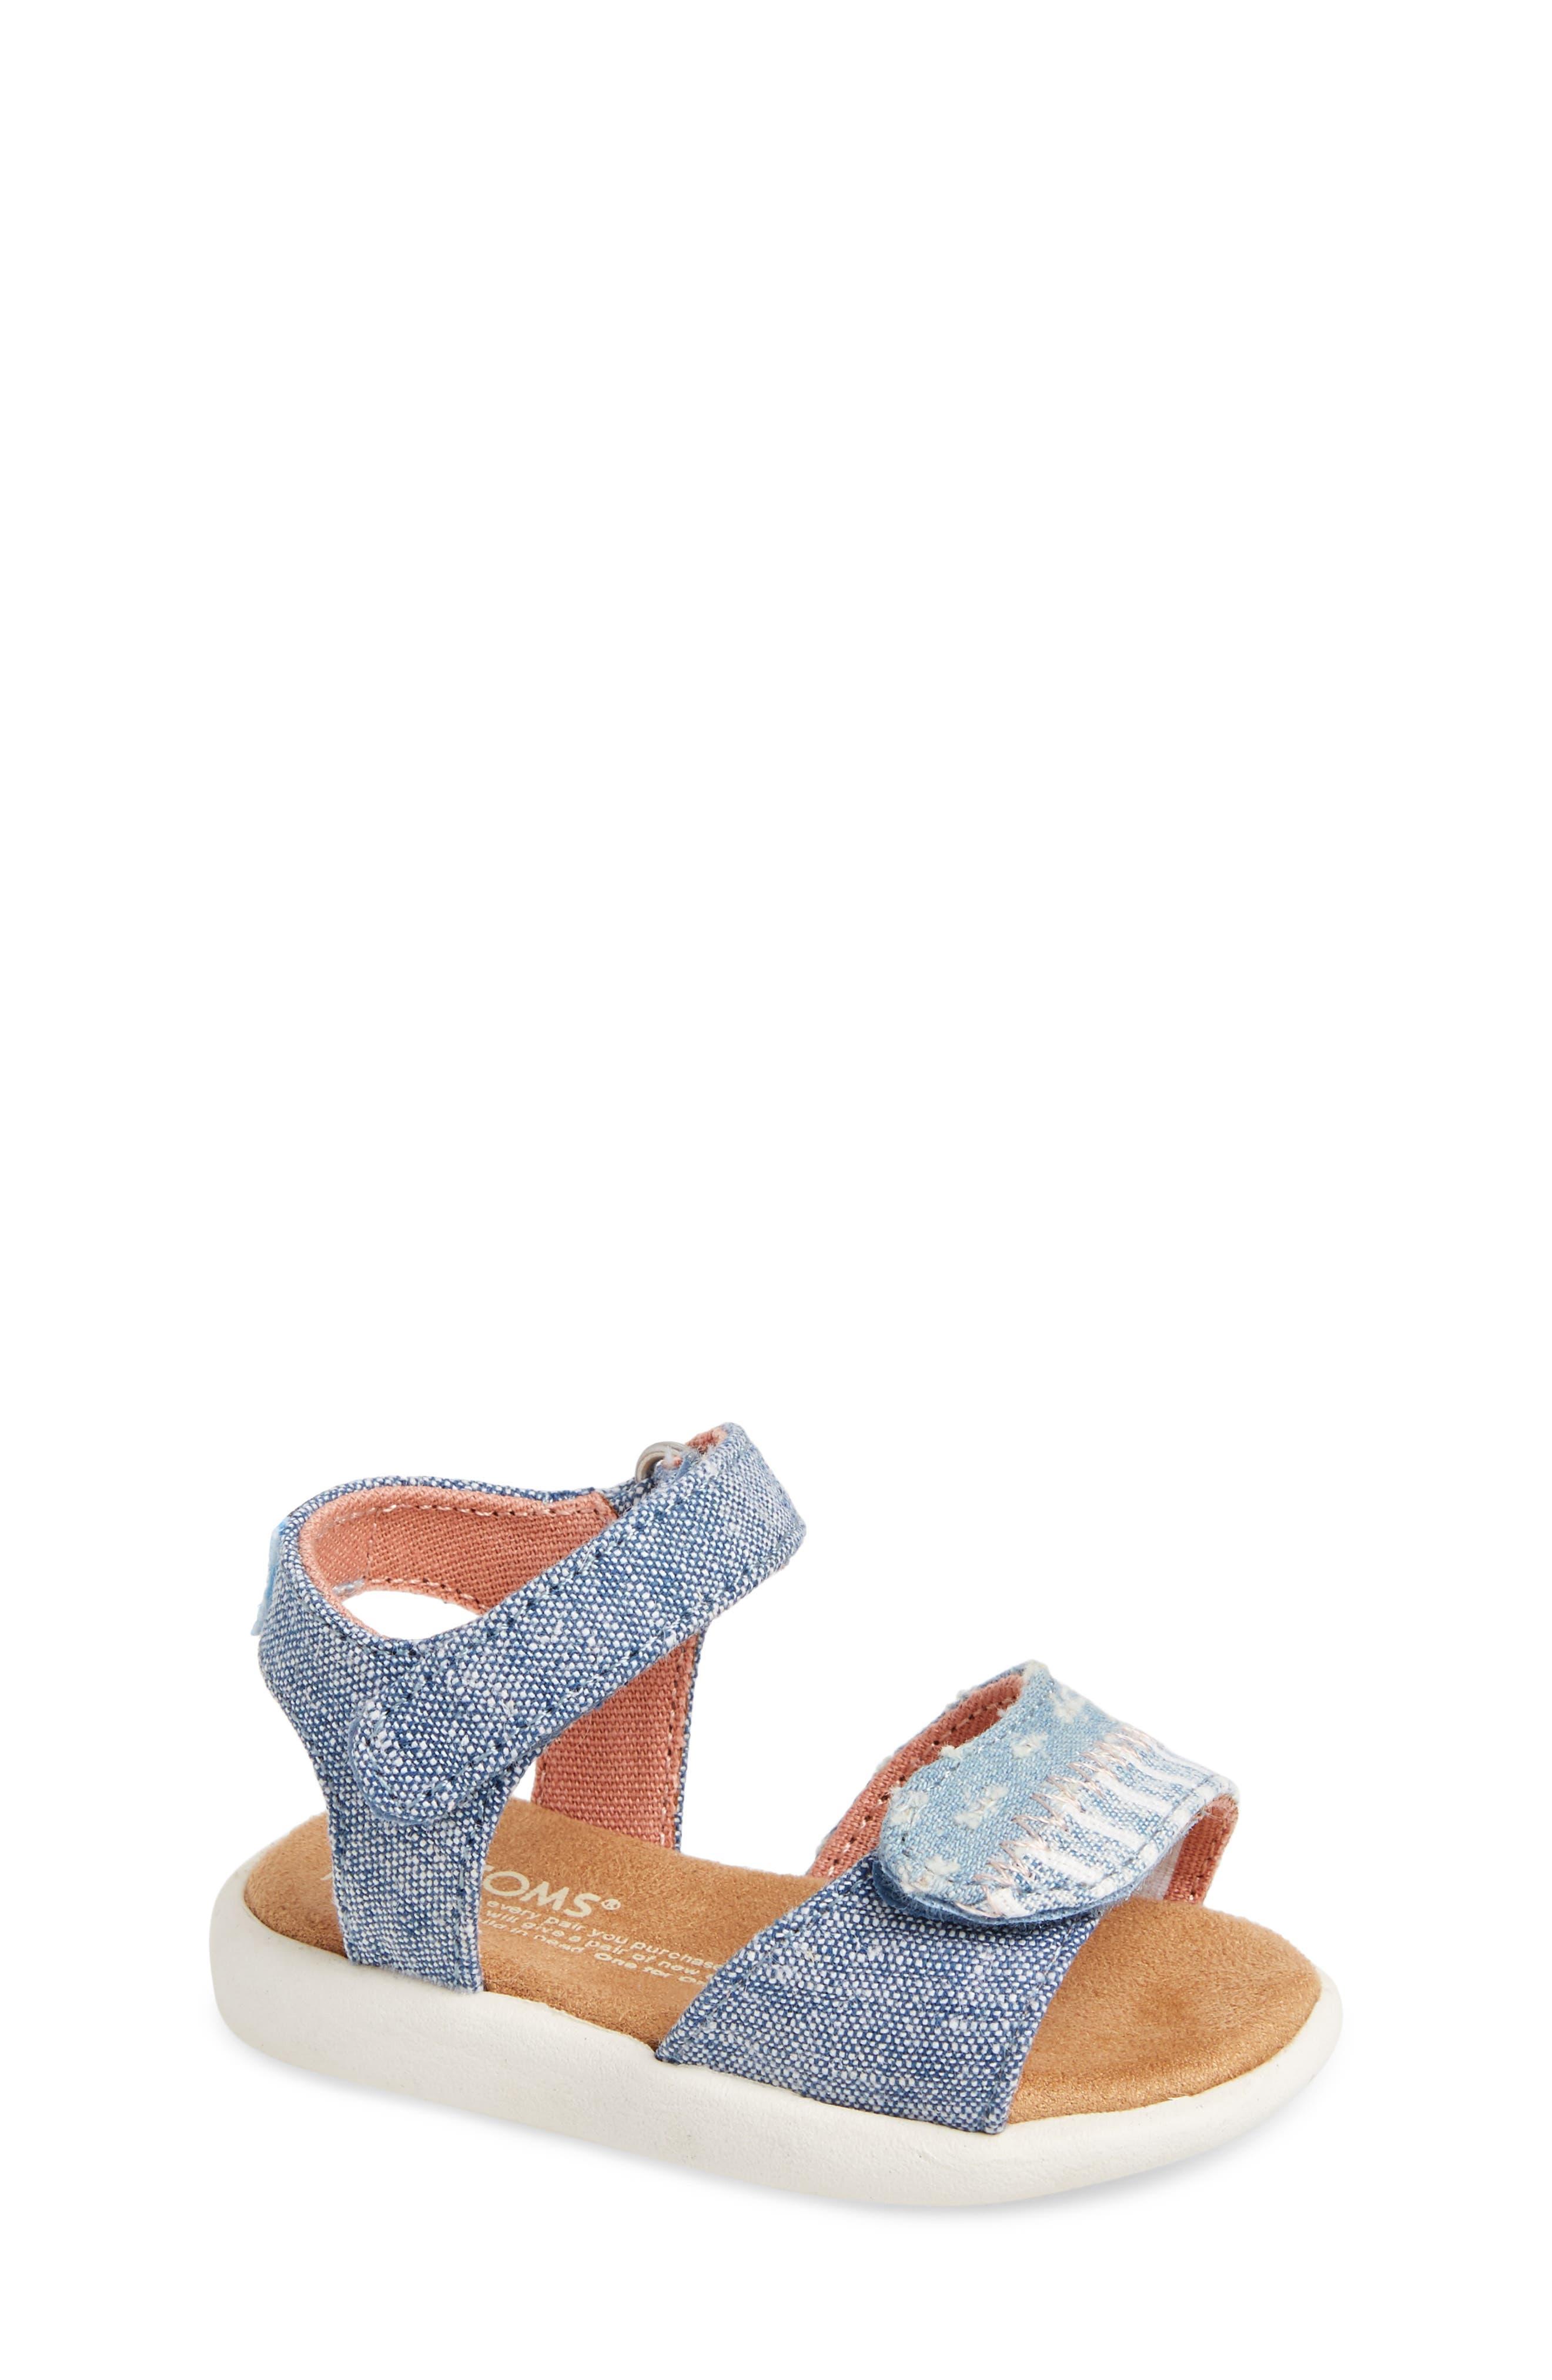 Strappy Sandal,                         Main,                         color, Blue Slub Chambray